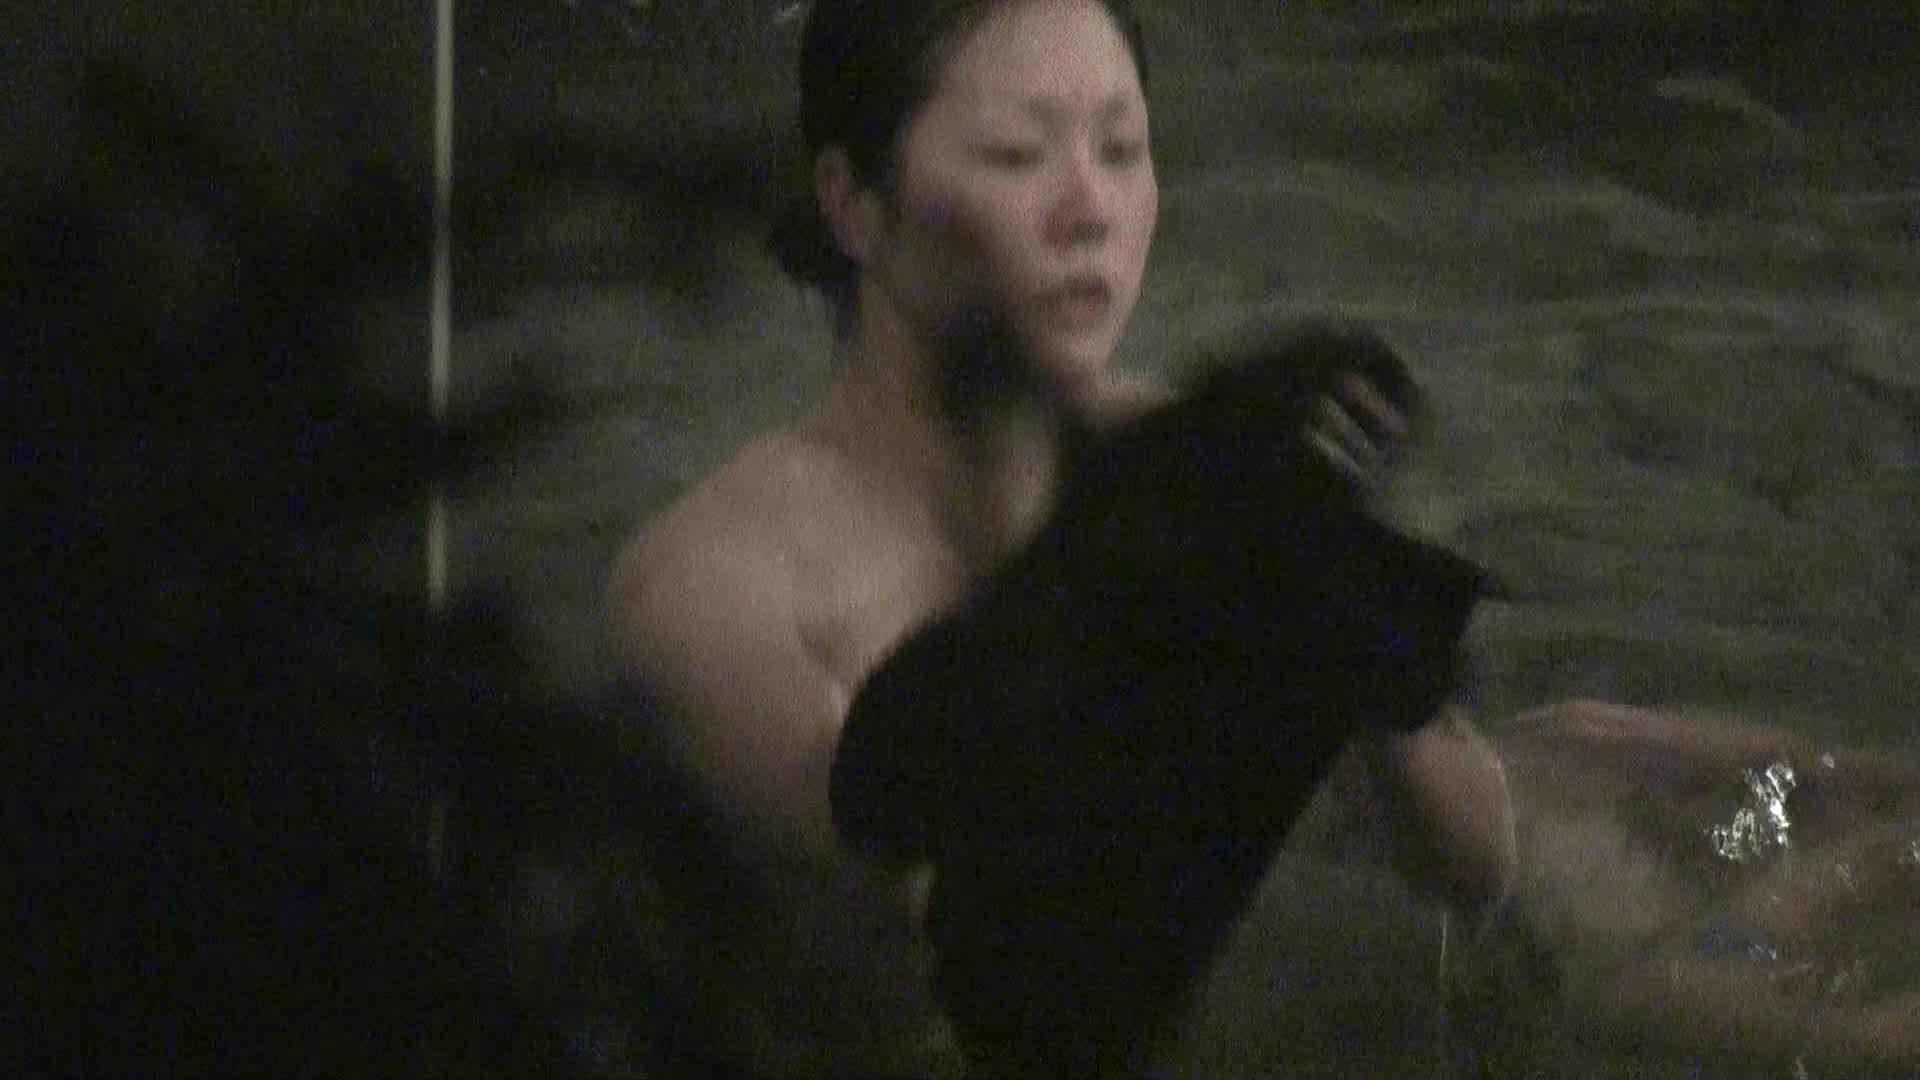 Aquaな露天風呂Vol.315 盗撮シリーズ | 露天風呂編  90PIX 7